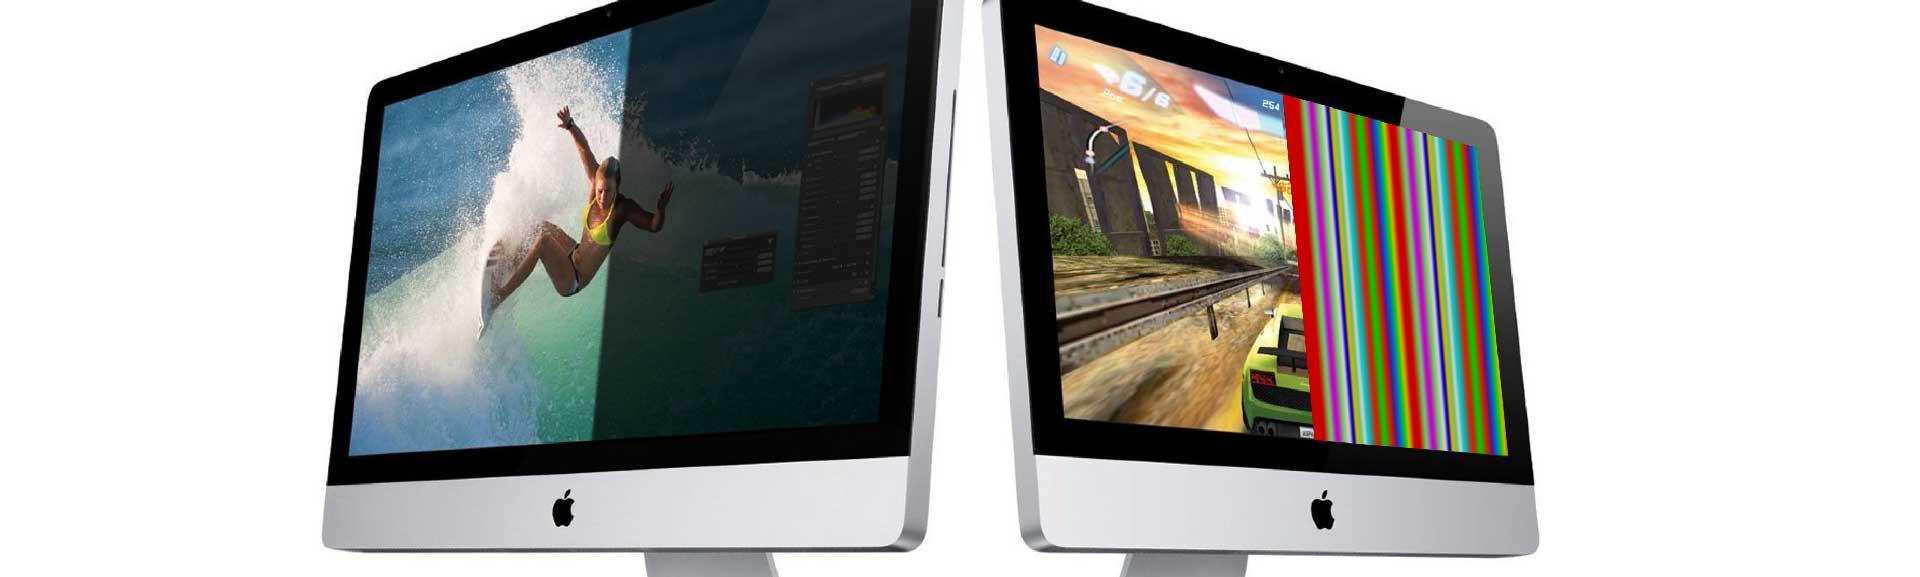 iMac пол экрана